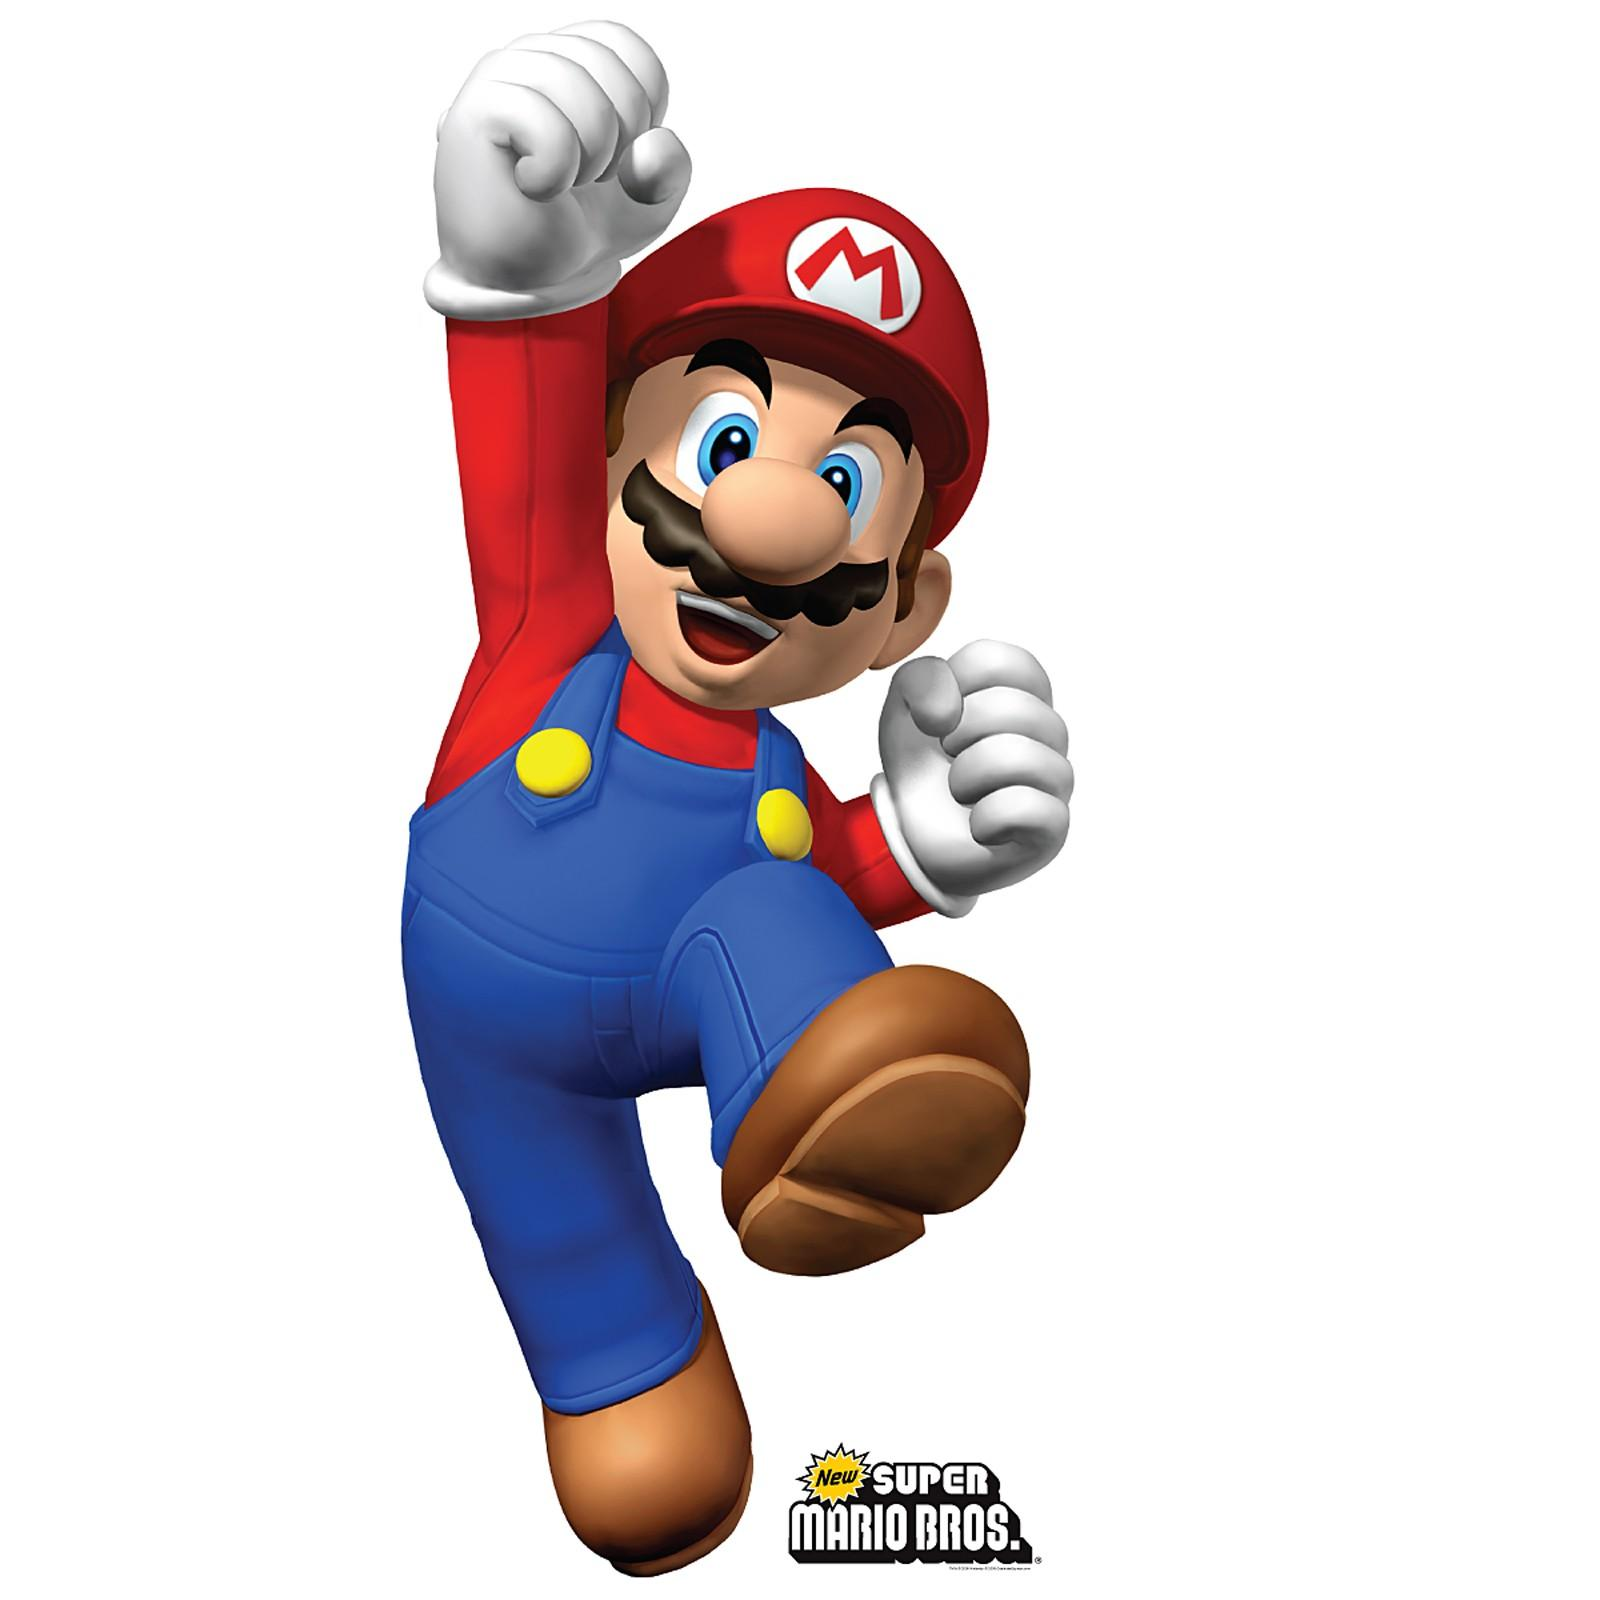 Super Mario Bros Free Printable Poster